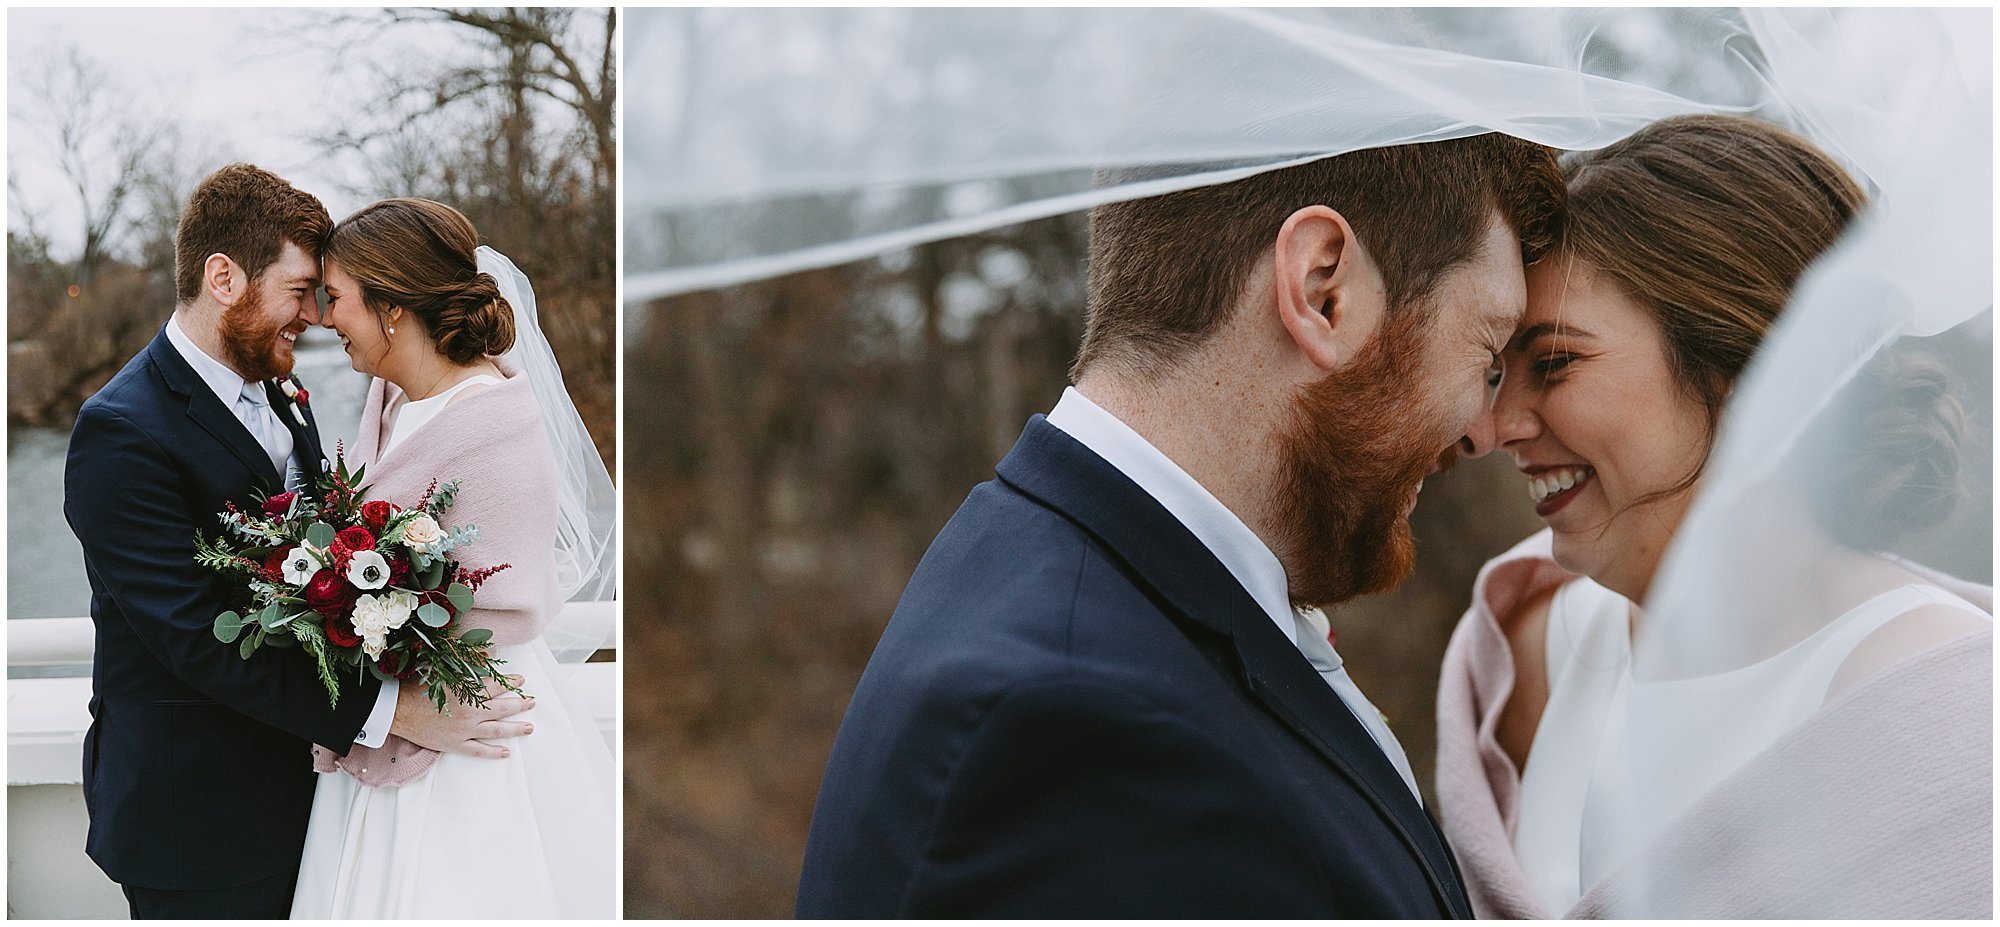 Under veil bride and groom